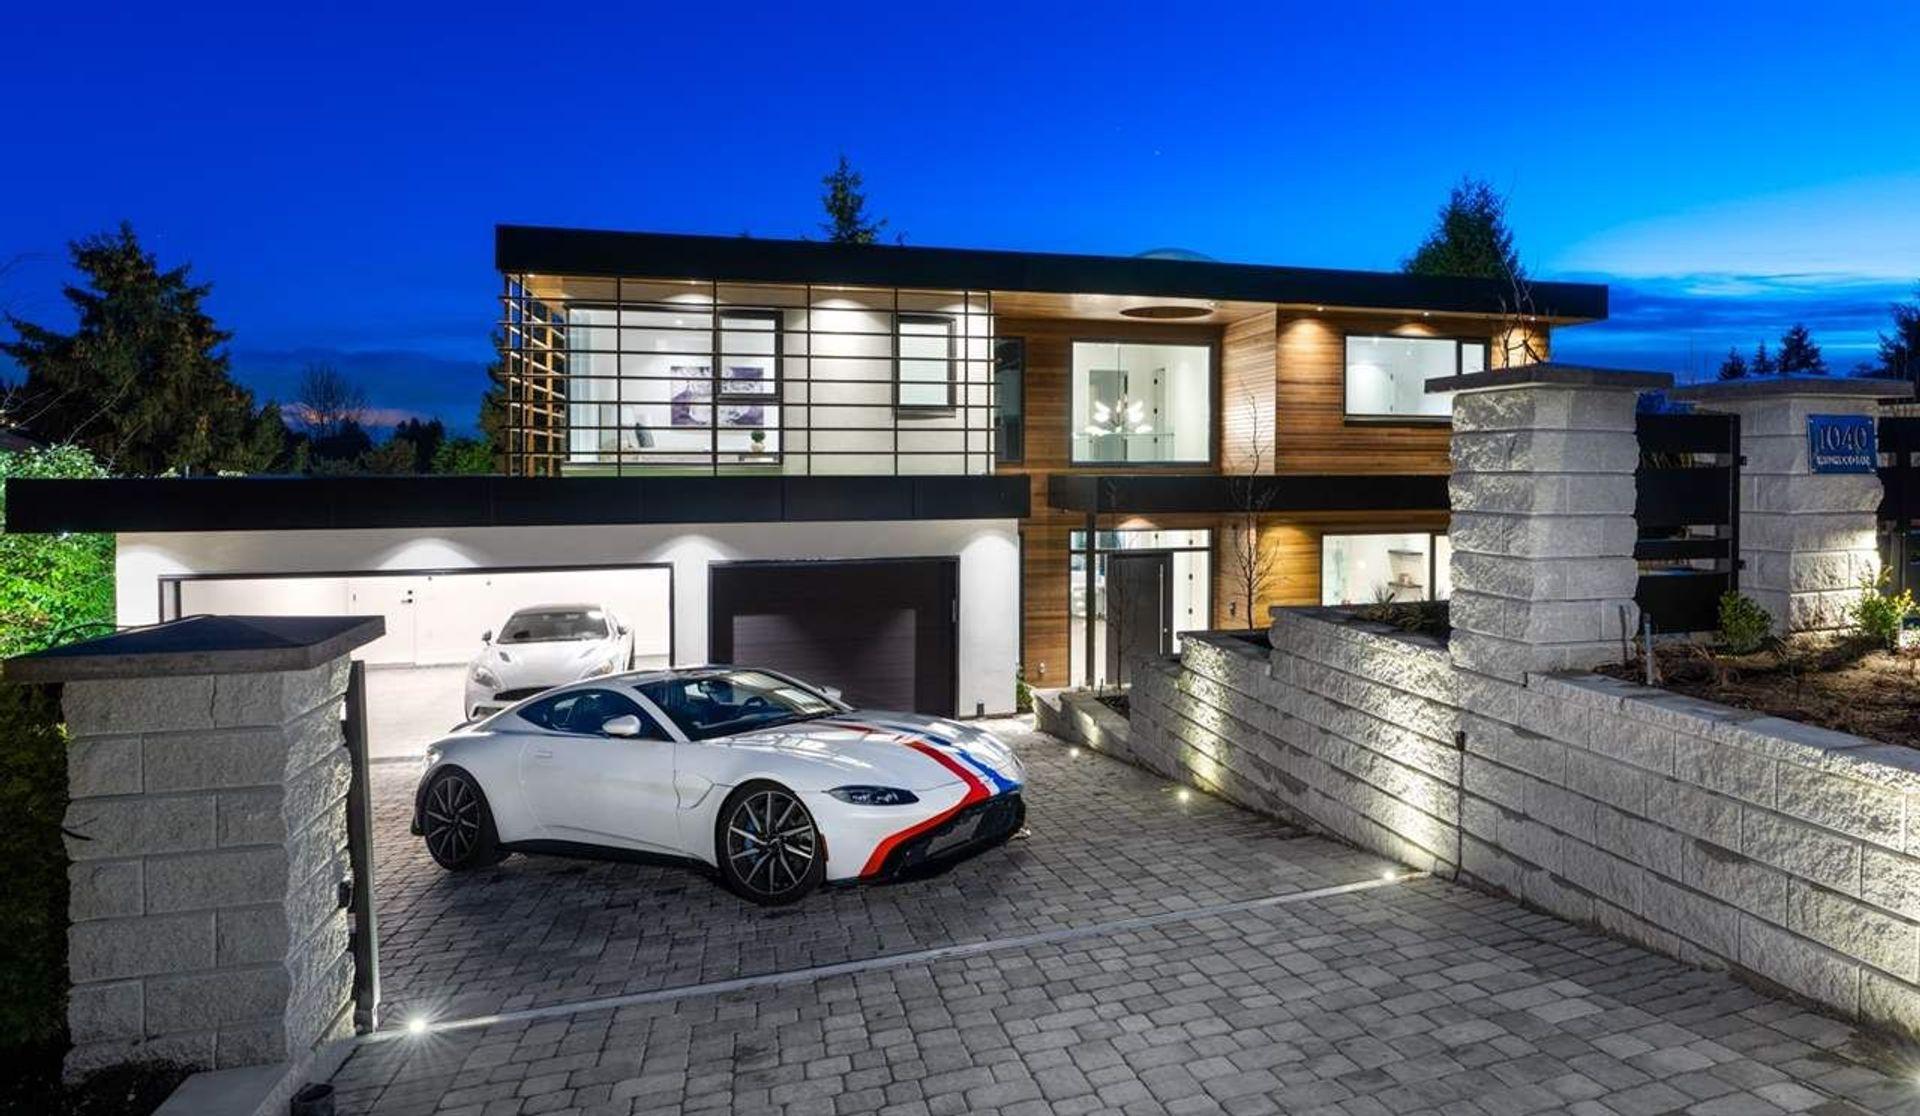 1040-wildwood-lane-british-properties-west-vancouver-06 at 1040 Wildwood Lane, British Properties, West Vancouver